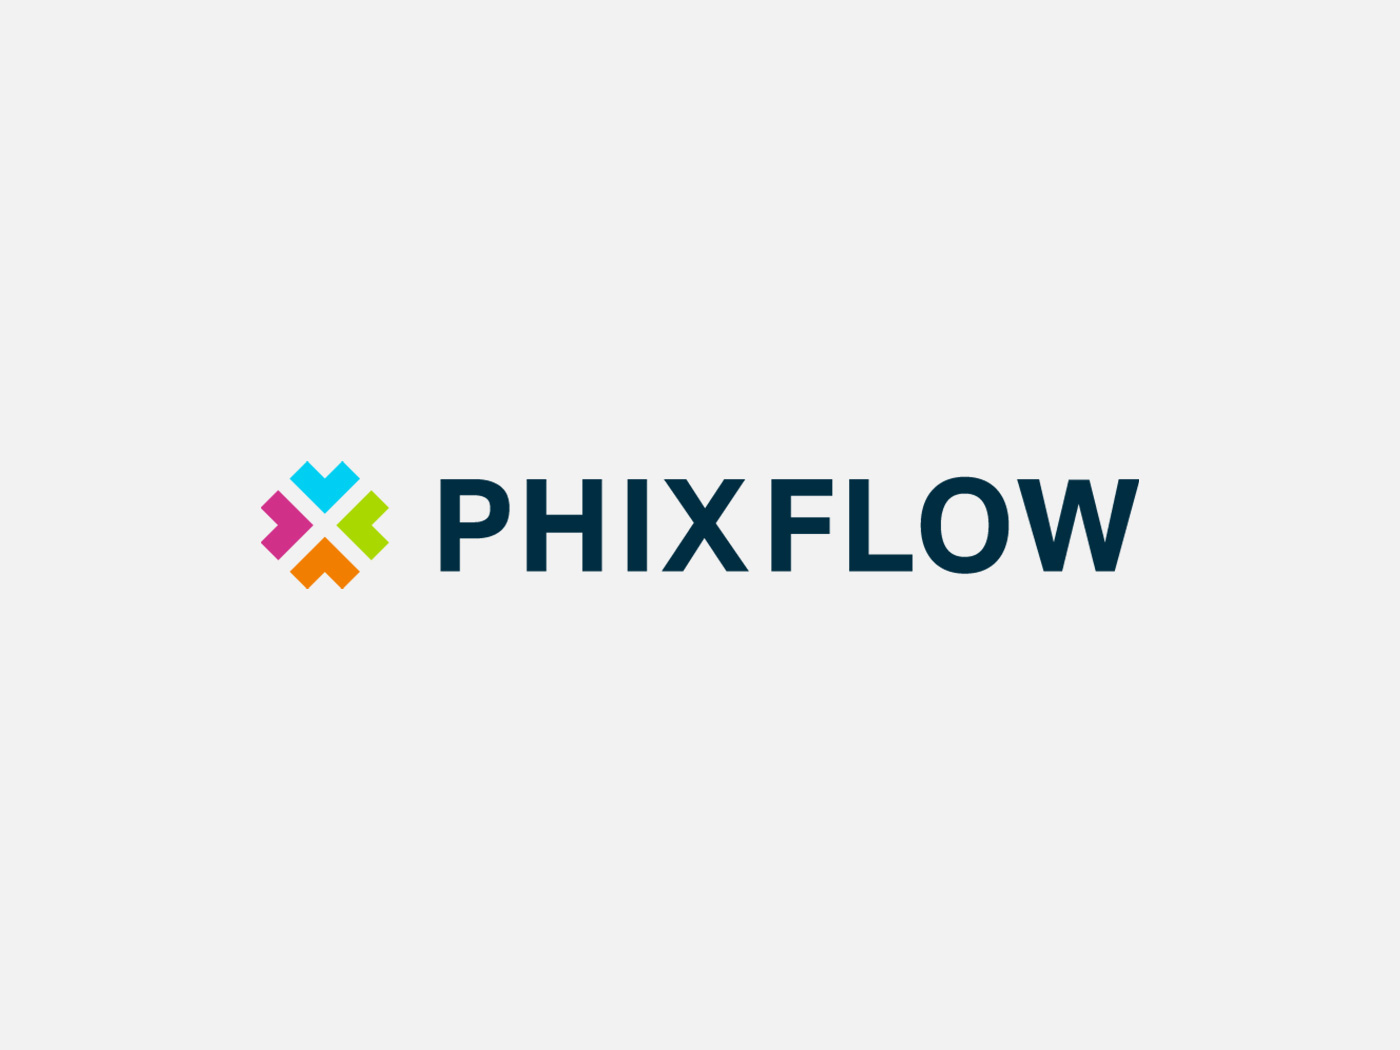 PhixFlow primary brand, by Chiara Mensa